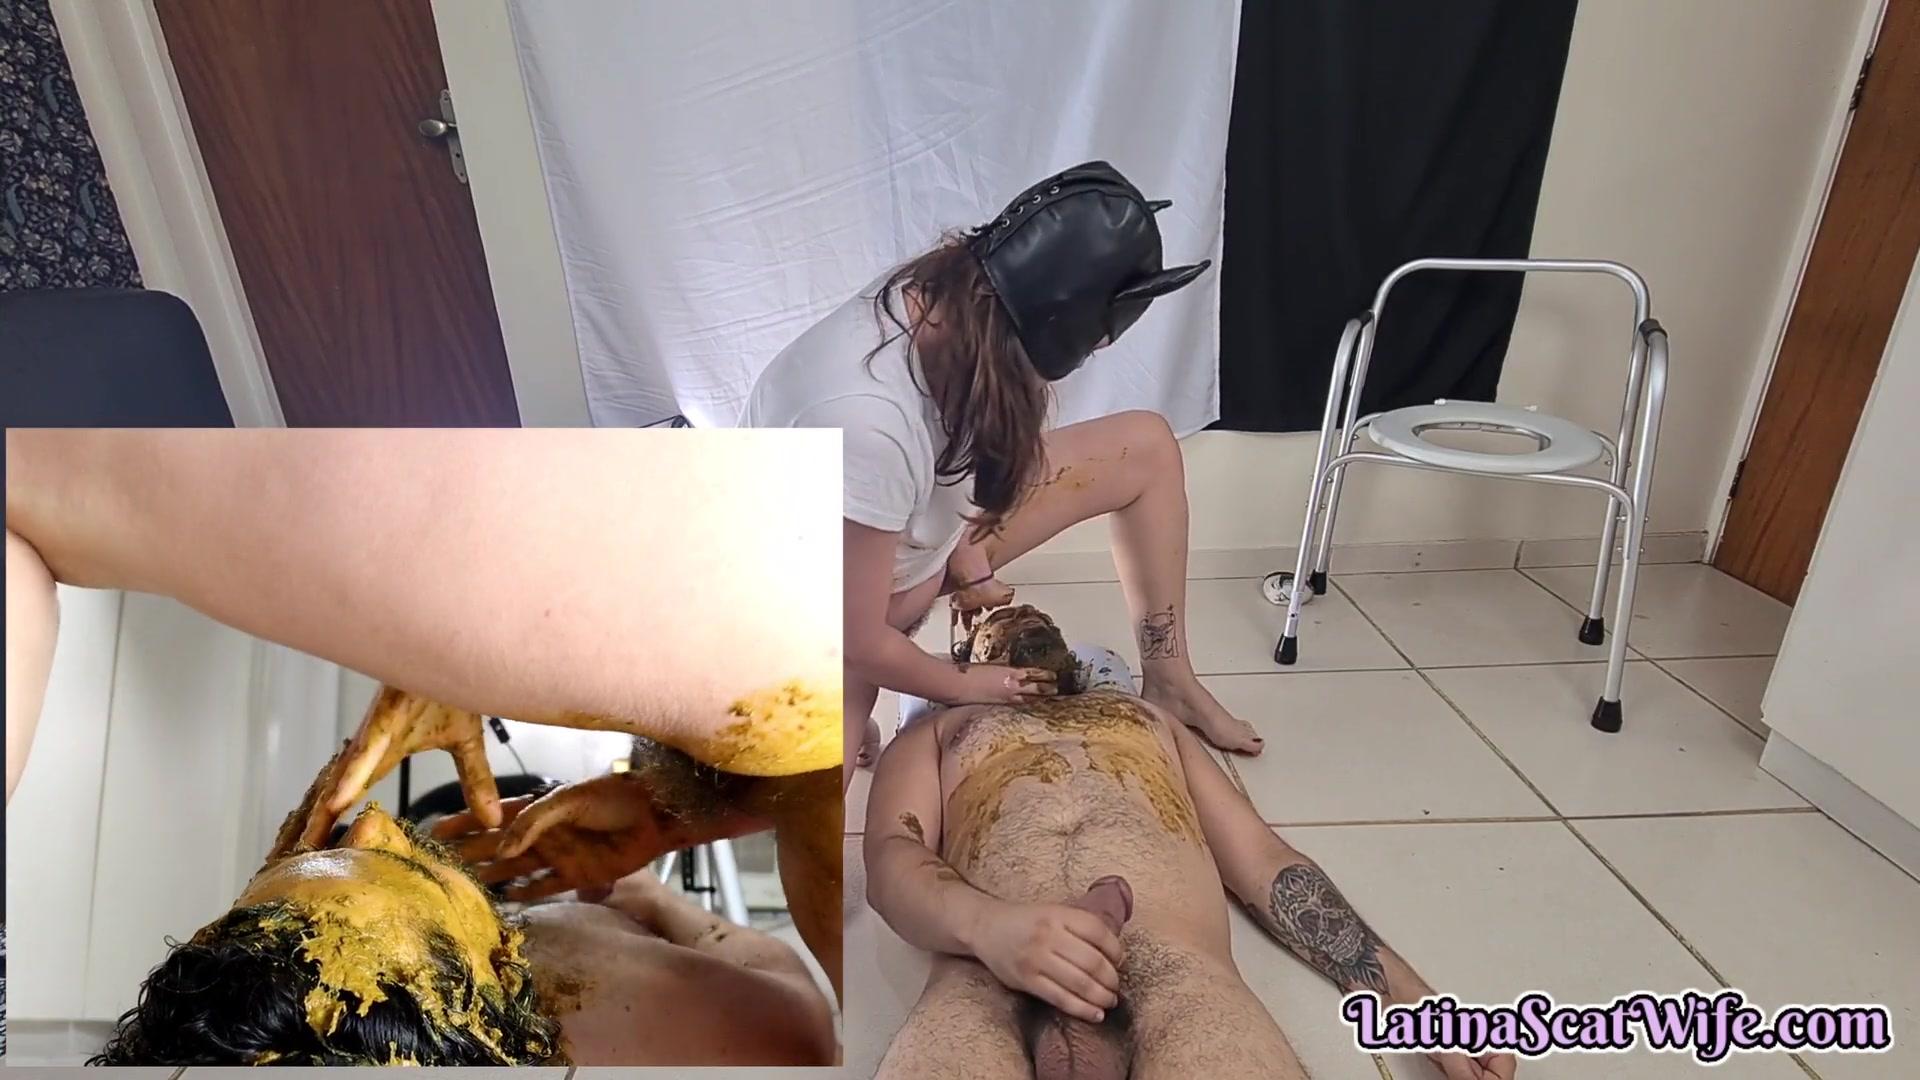 LatinaScatWife - Having Fun With The Bathroom Slave 00003